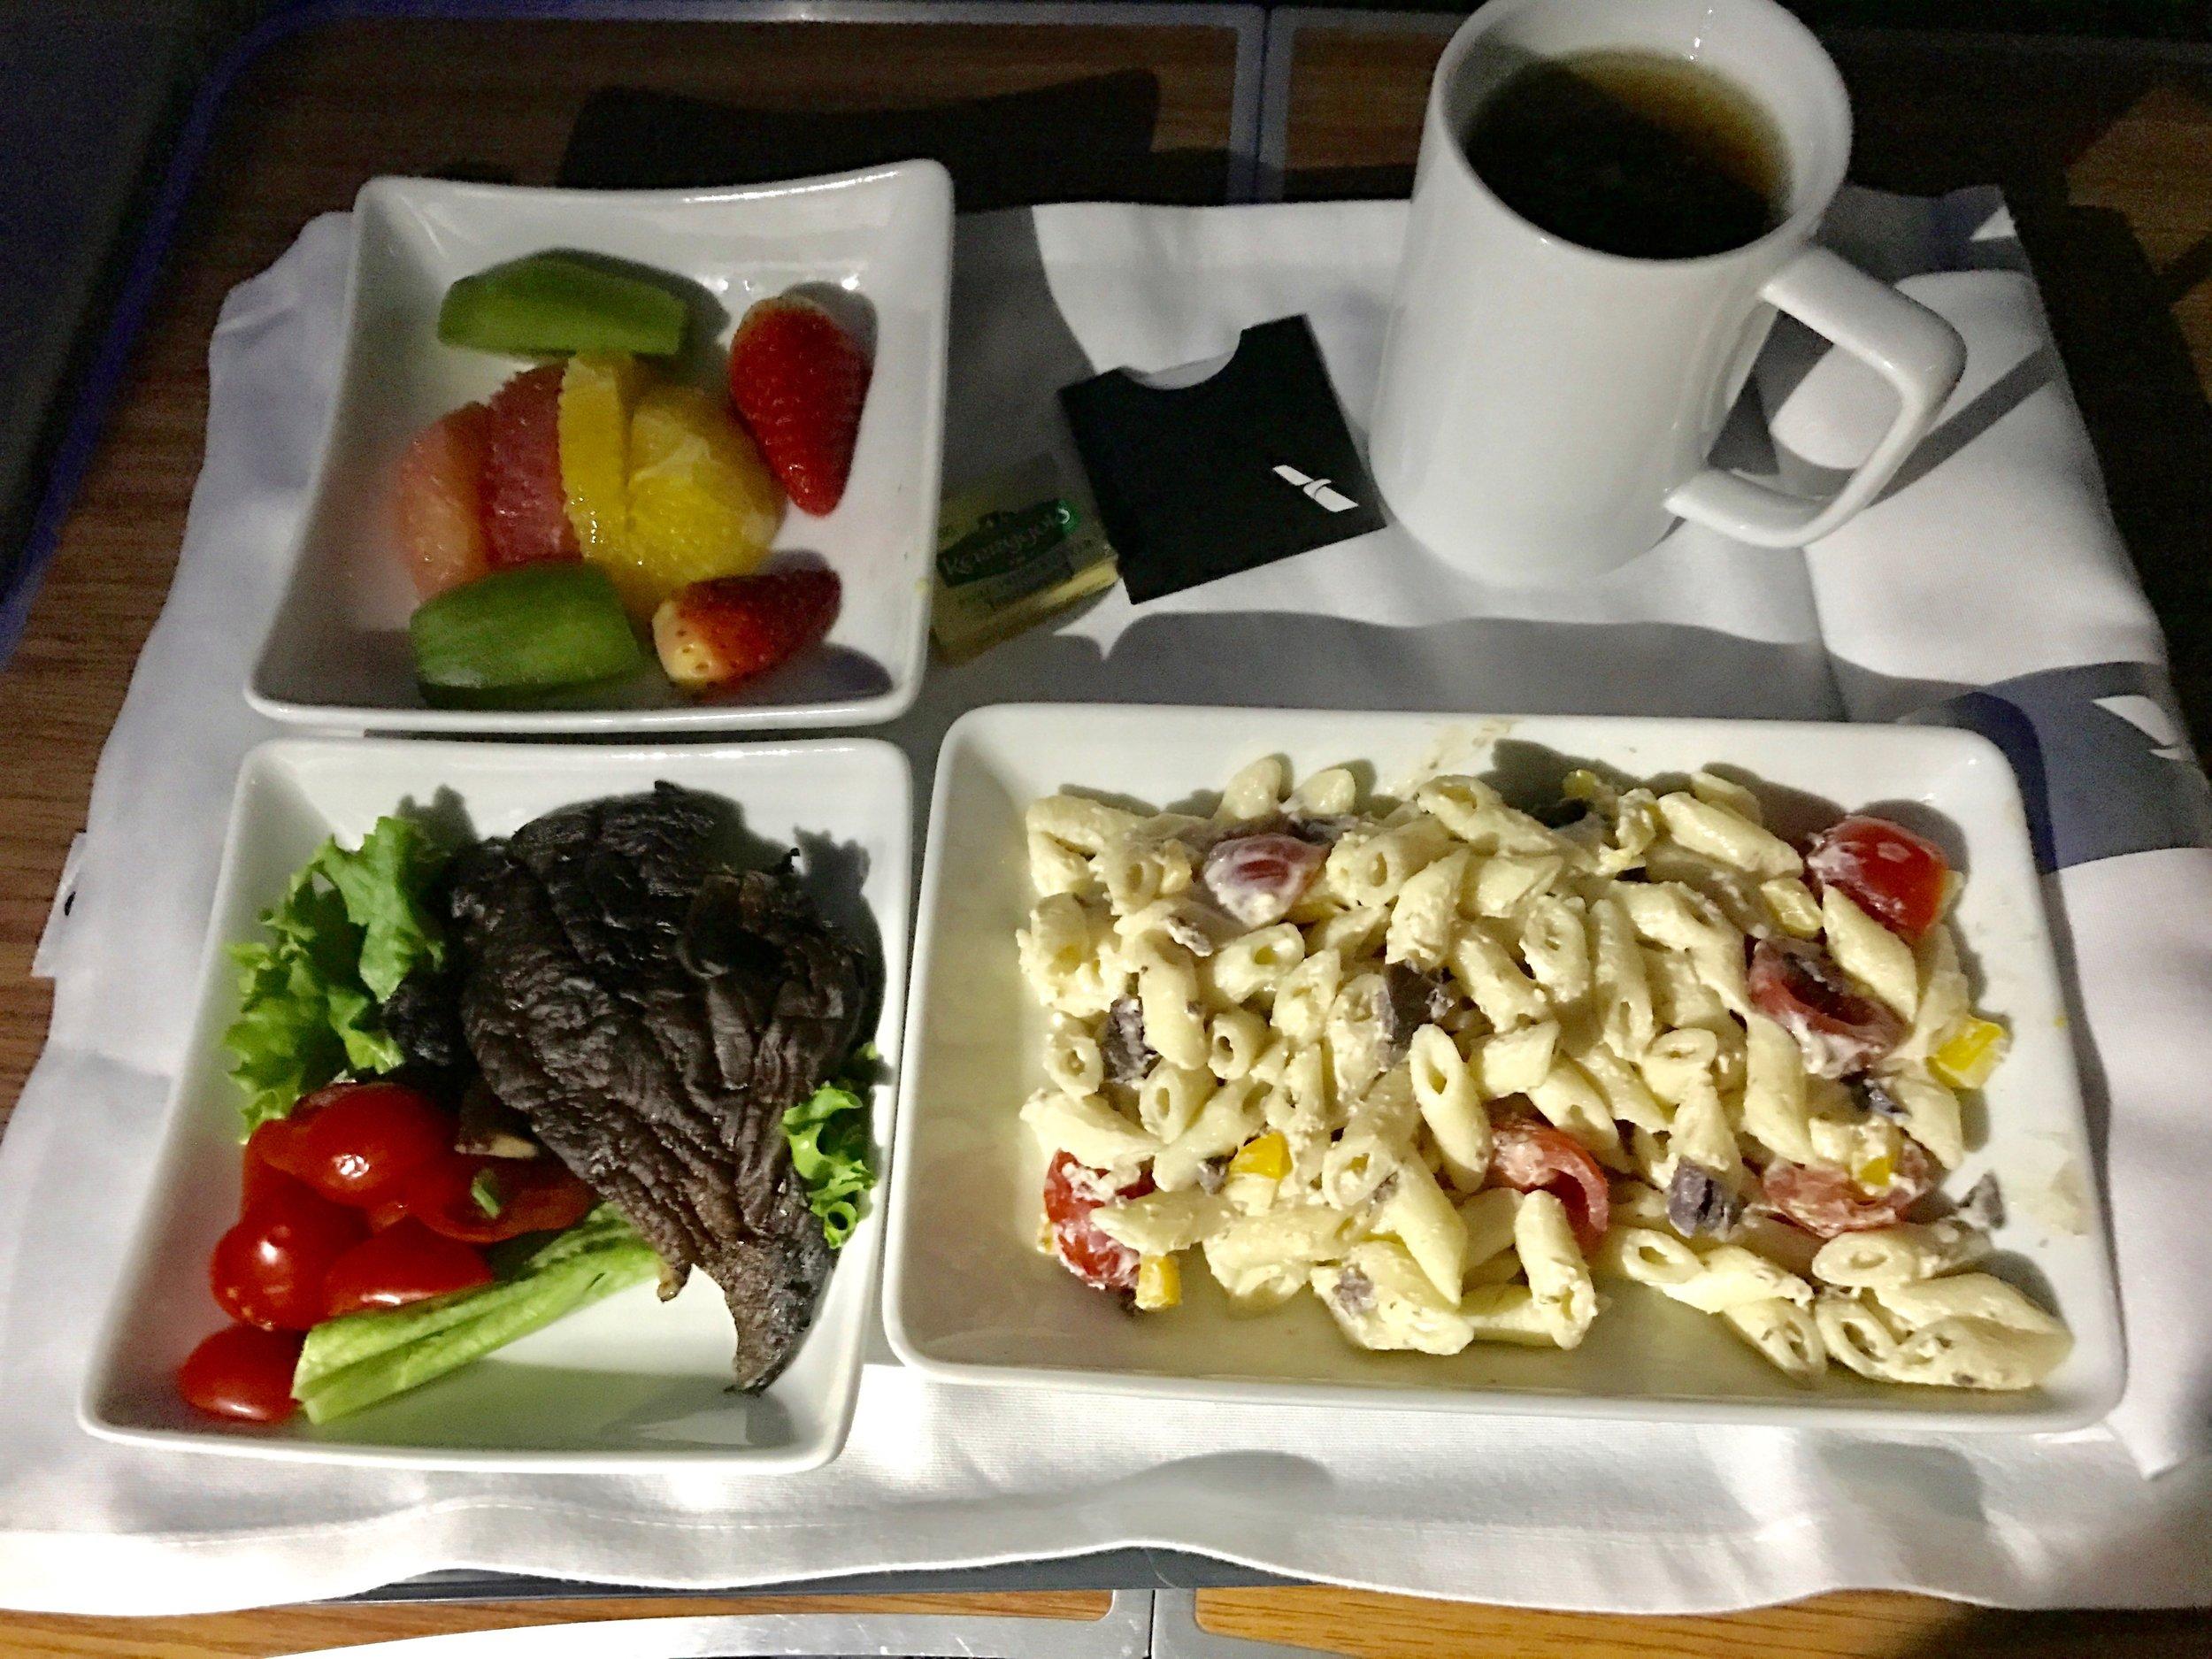 AA 787 Dreamliner Business Class vegetarian breakfast